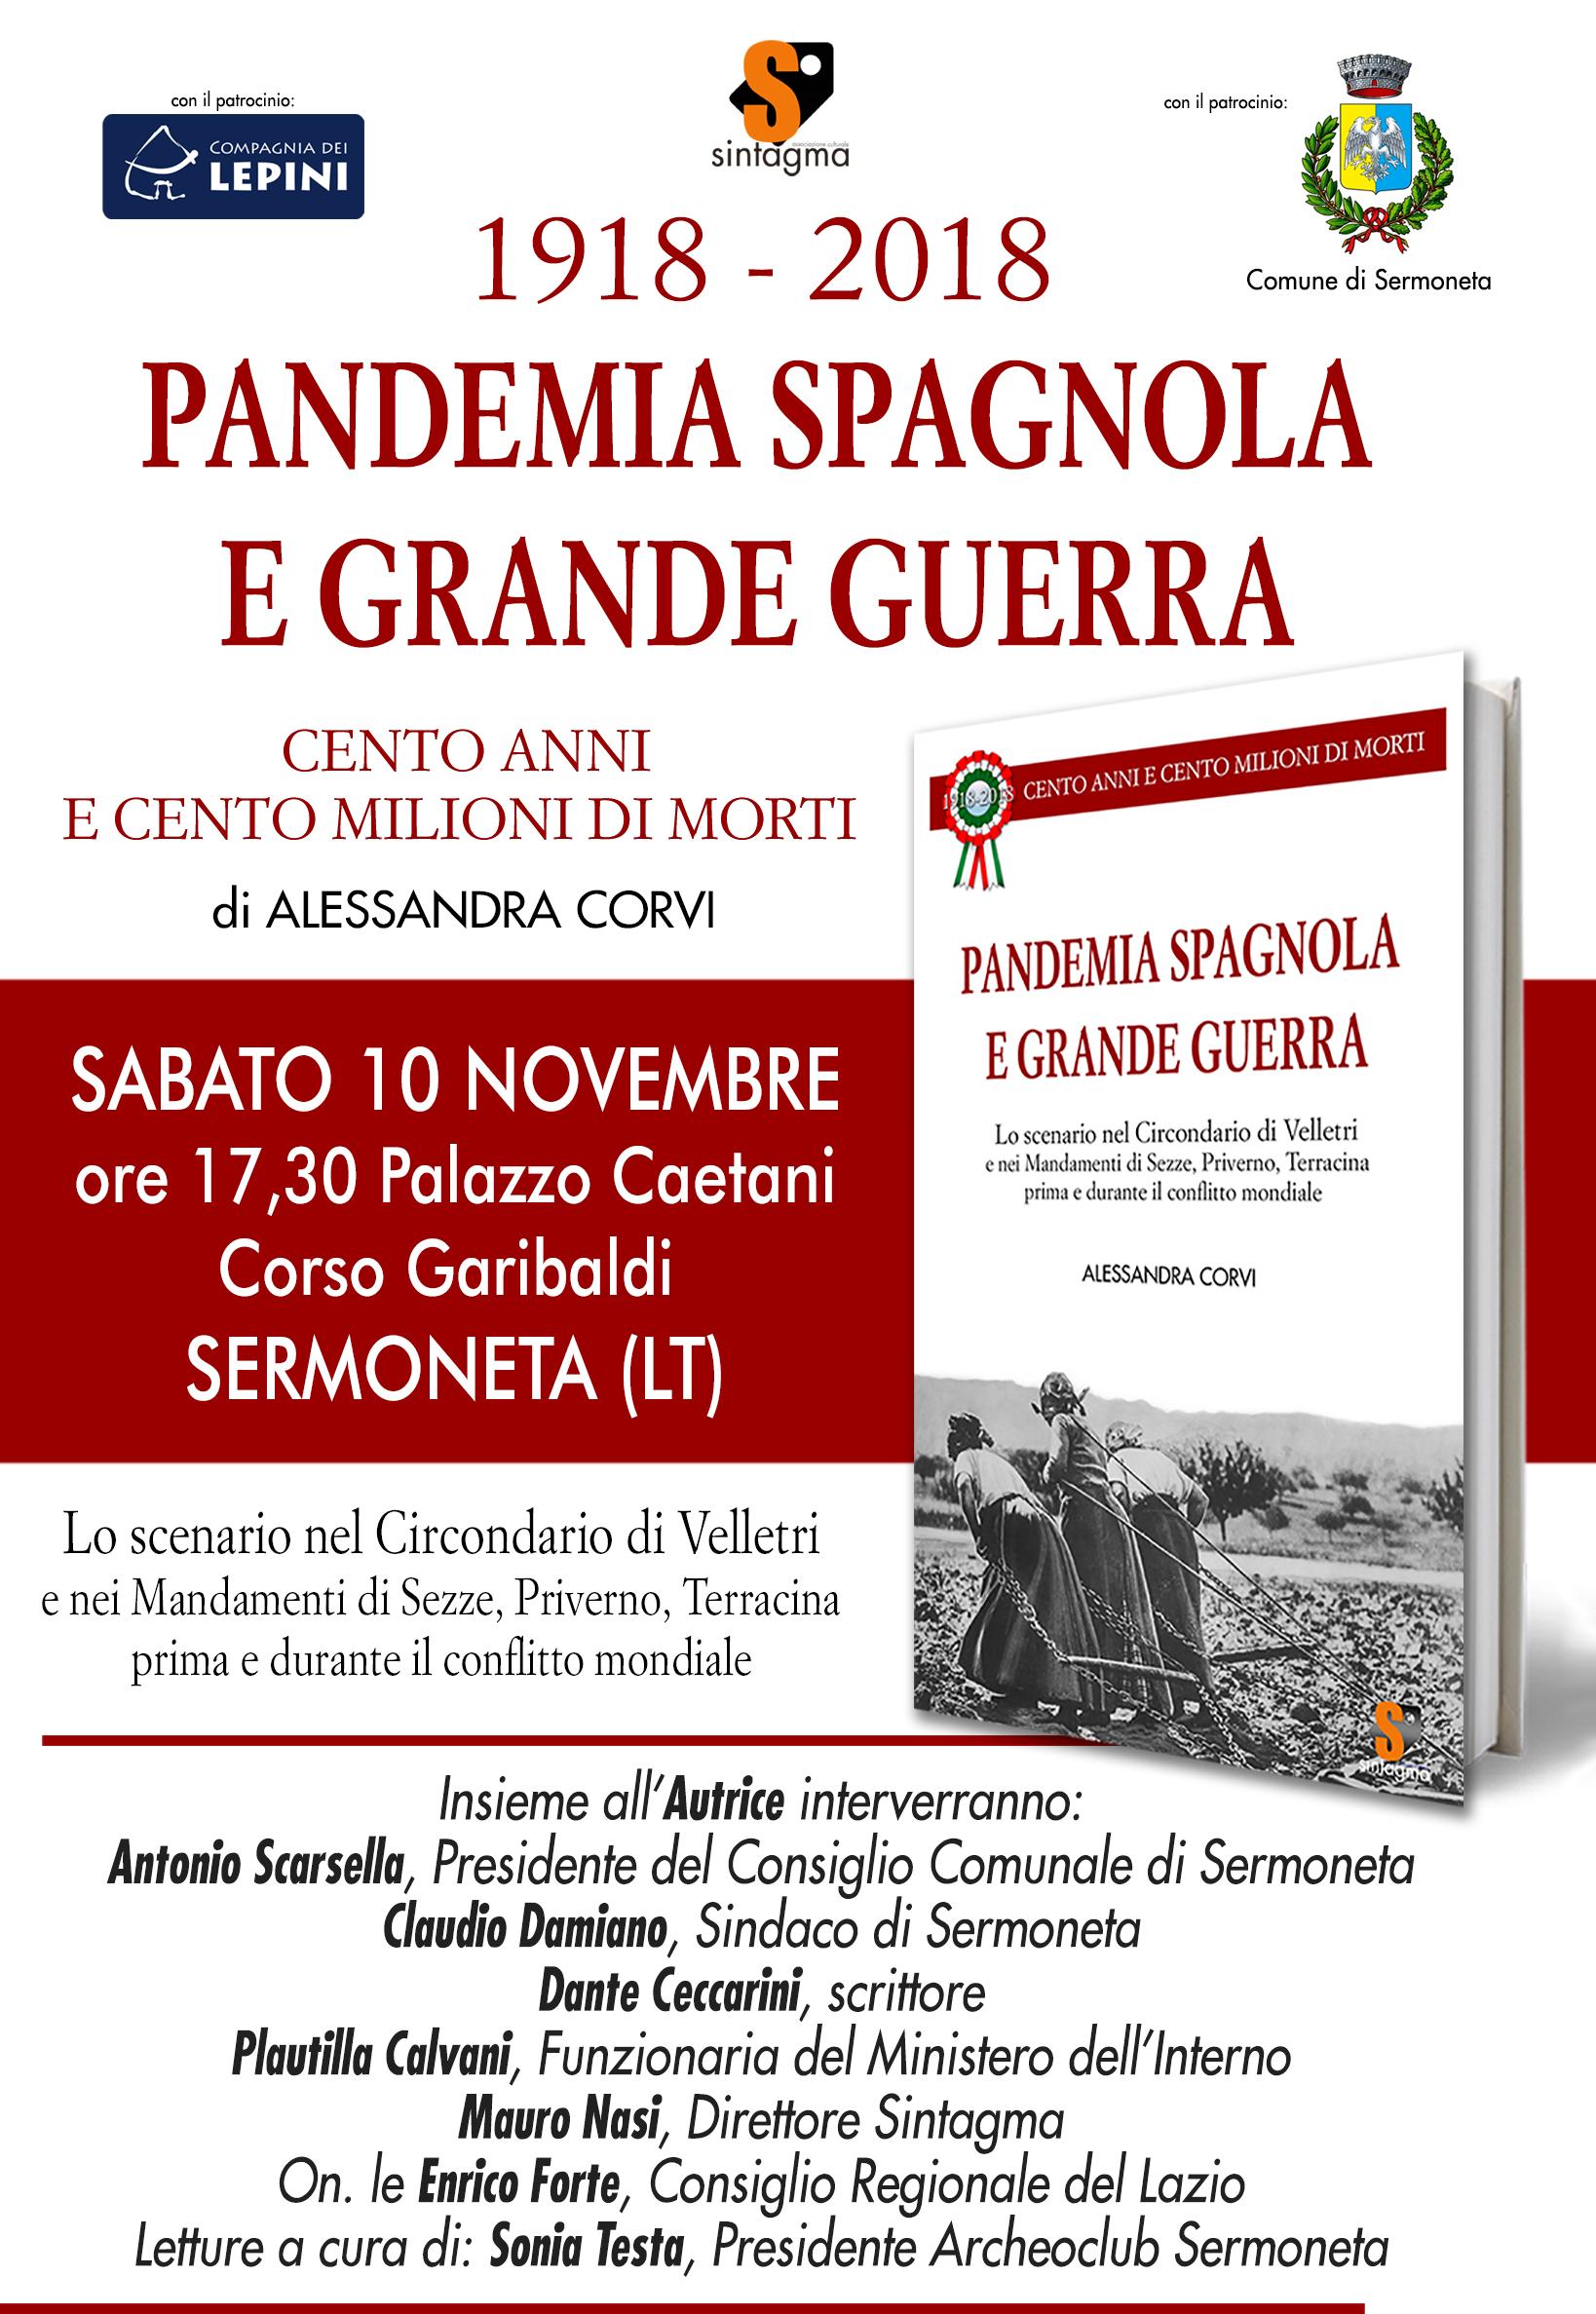 Pandwmia Spagnola e Grande Guerra